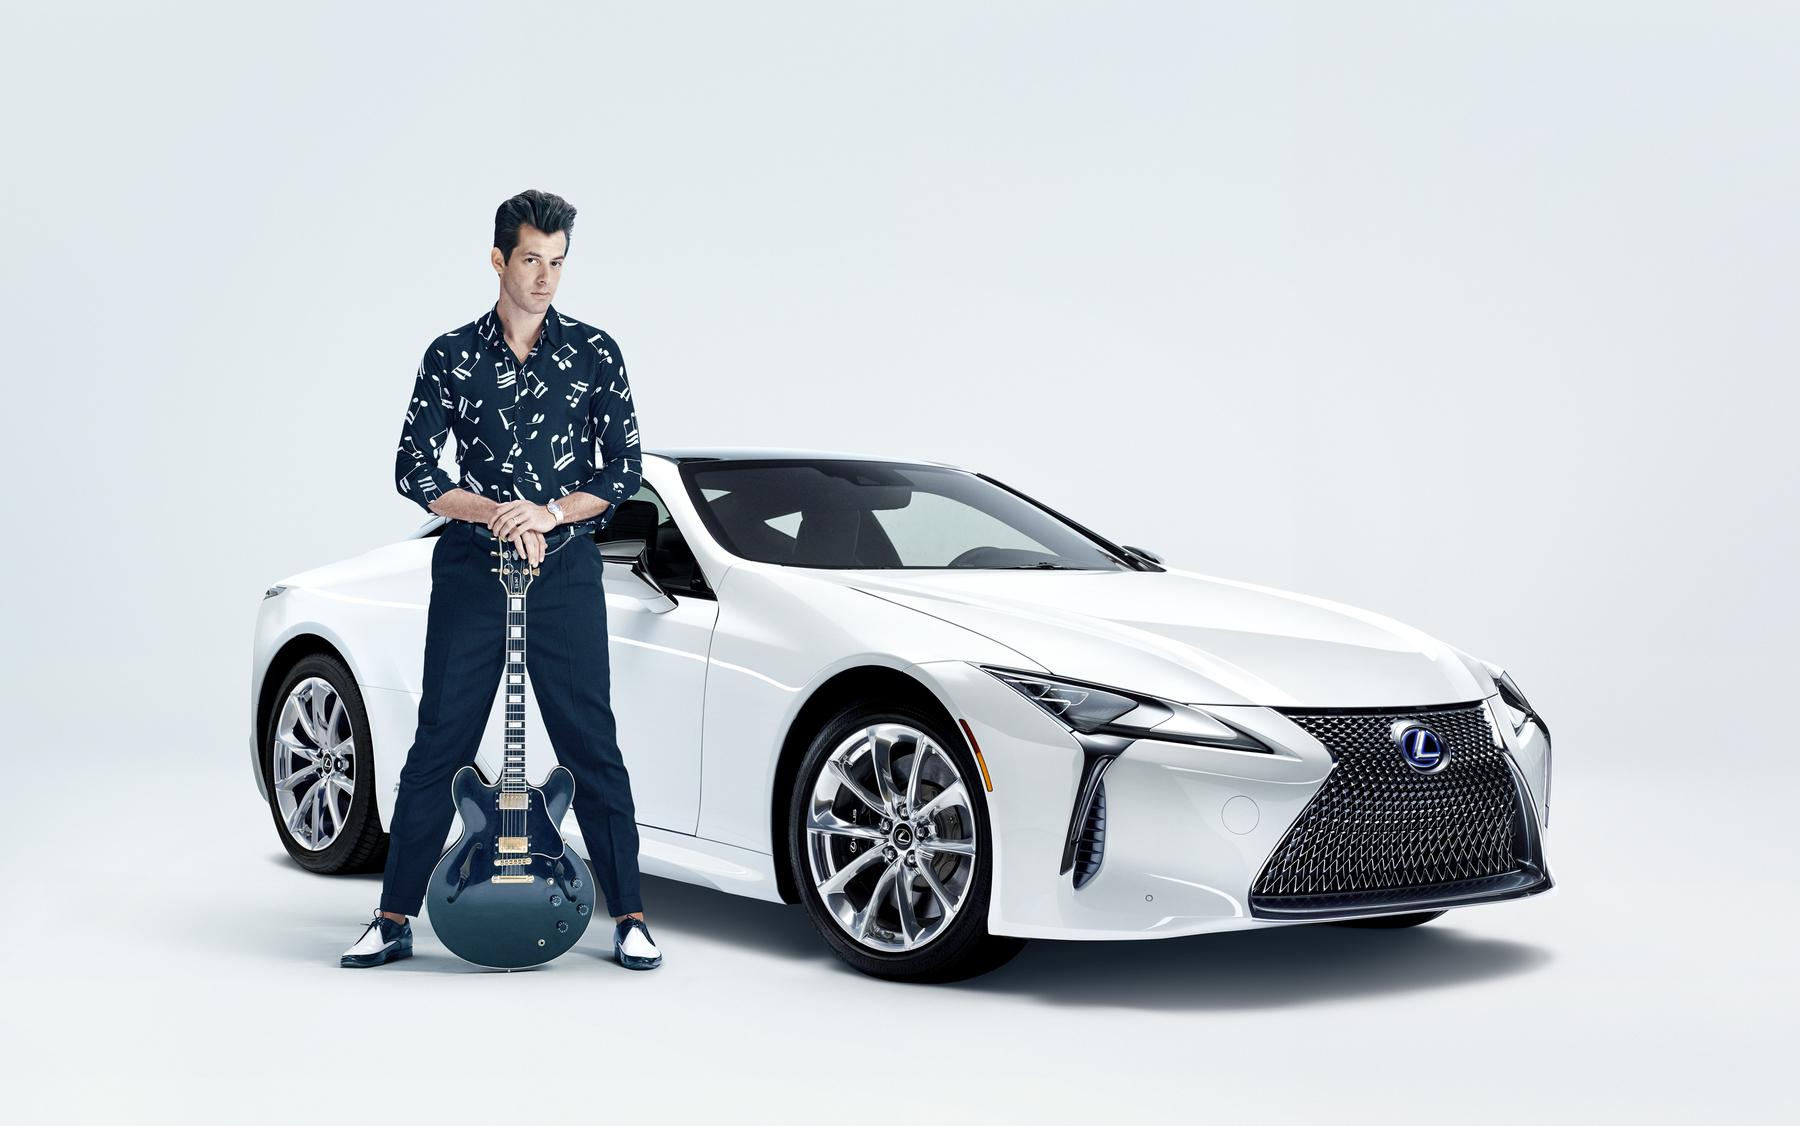 Lexus x Mark Ronson Announcement 7 F